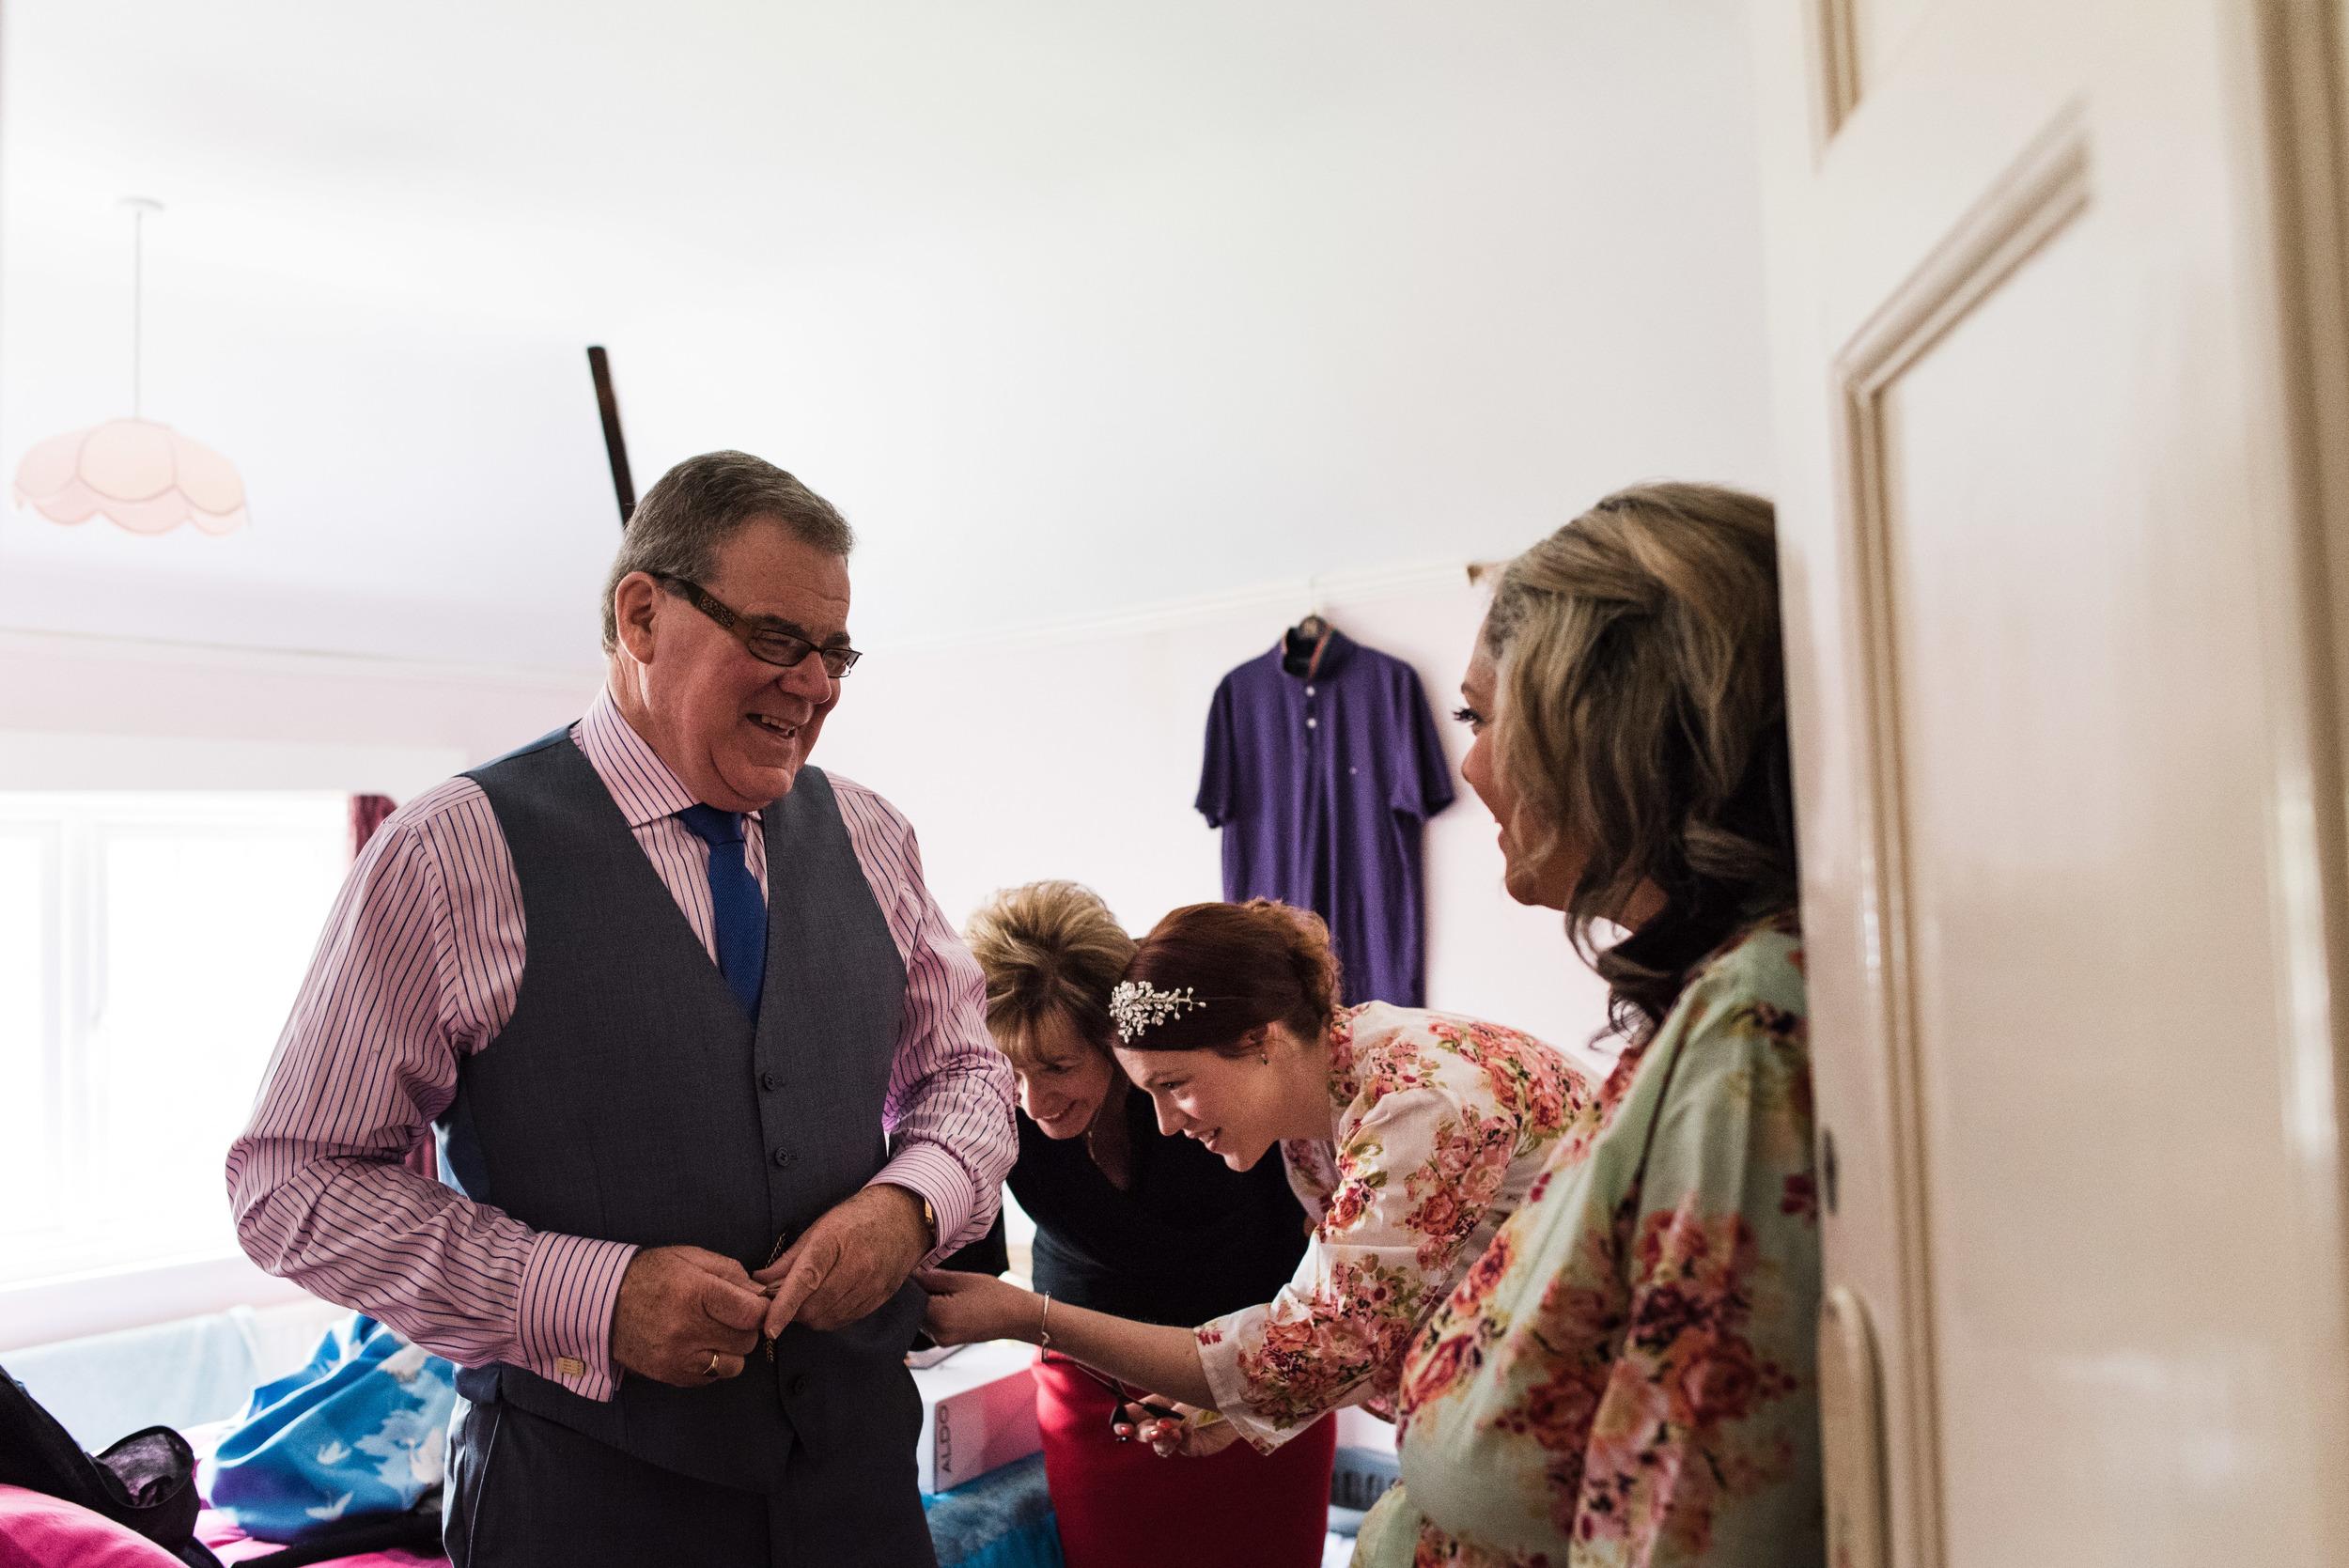 father gets finishing touches - ufton court wedding photographer